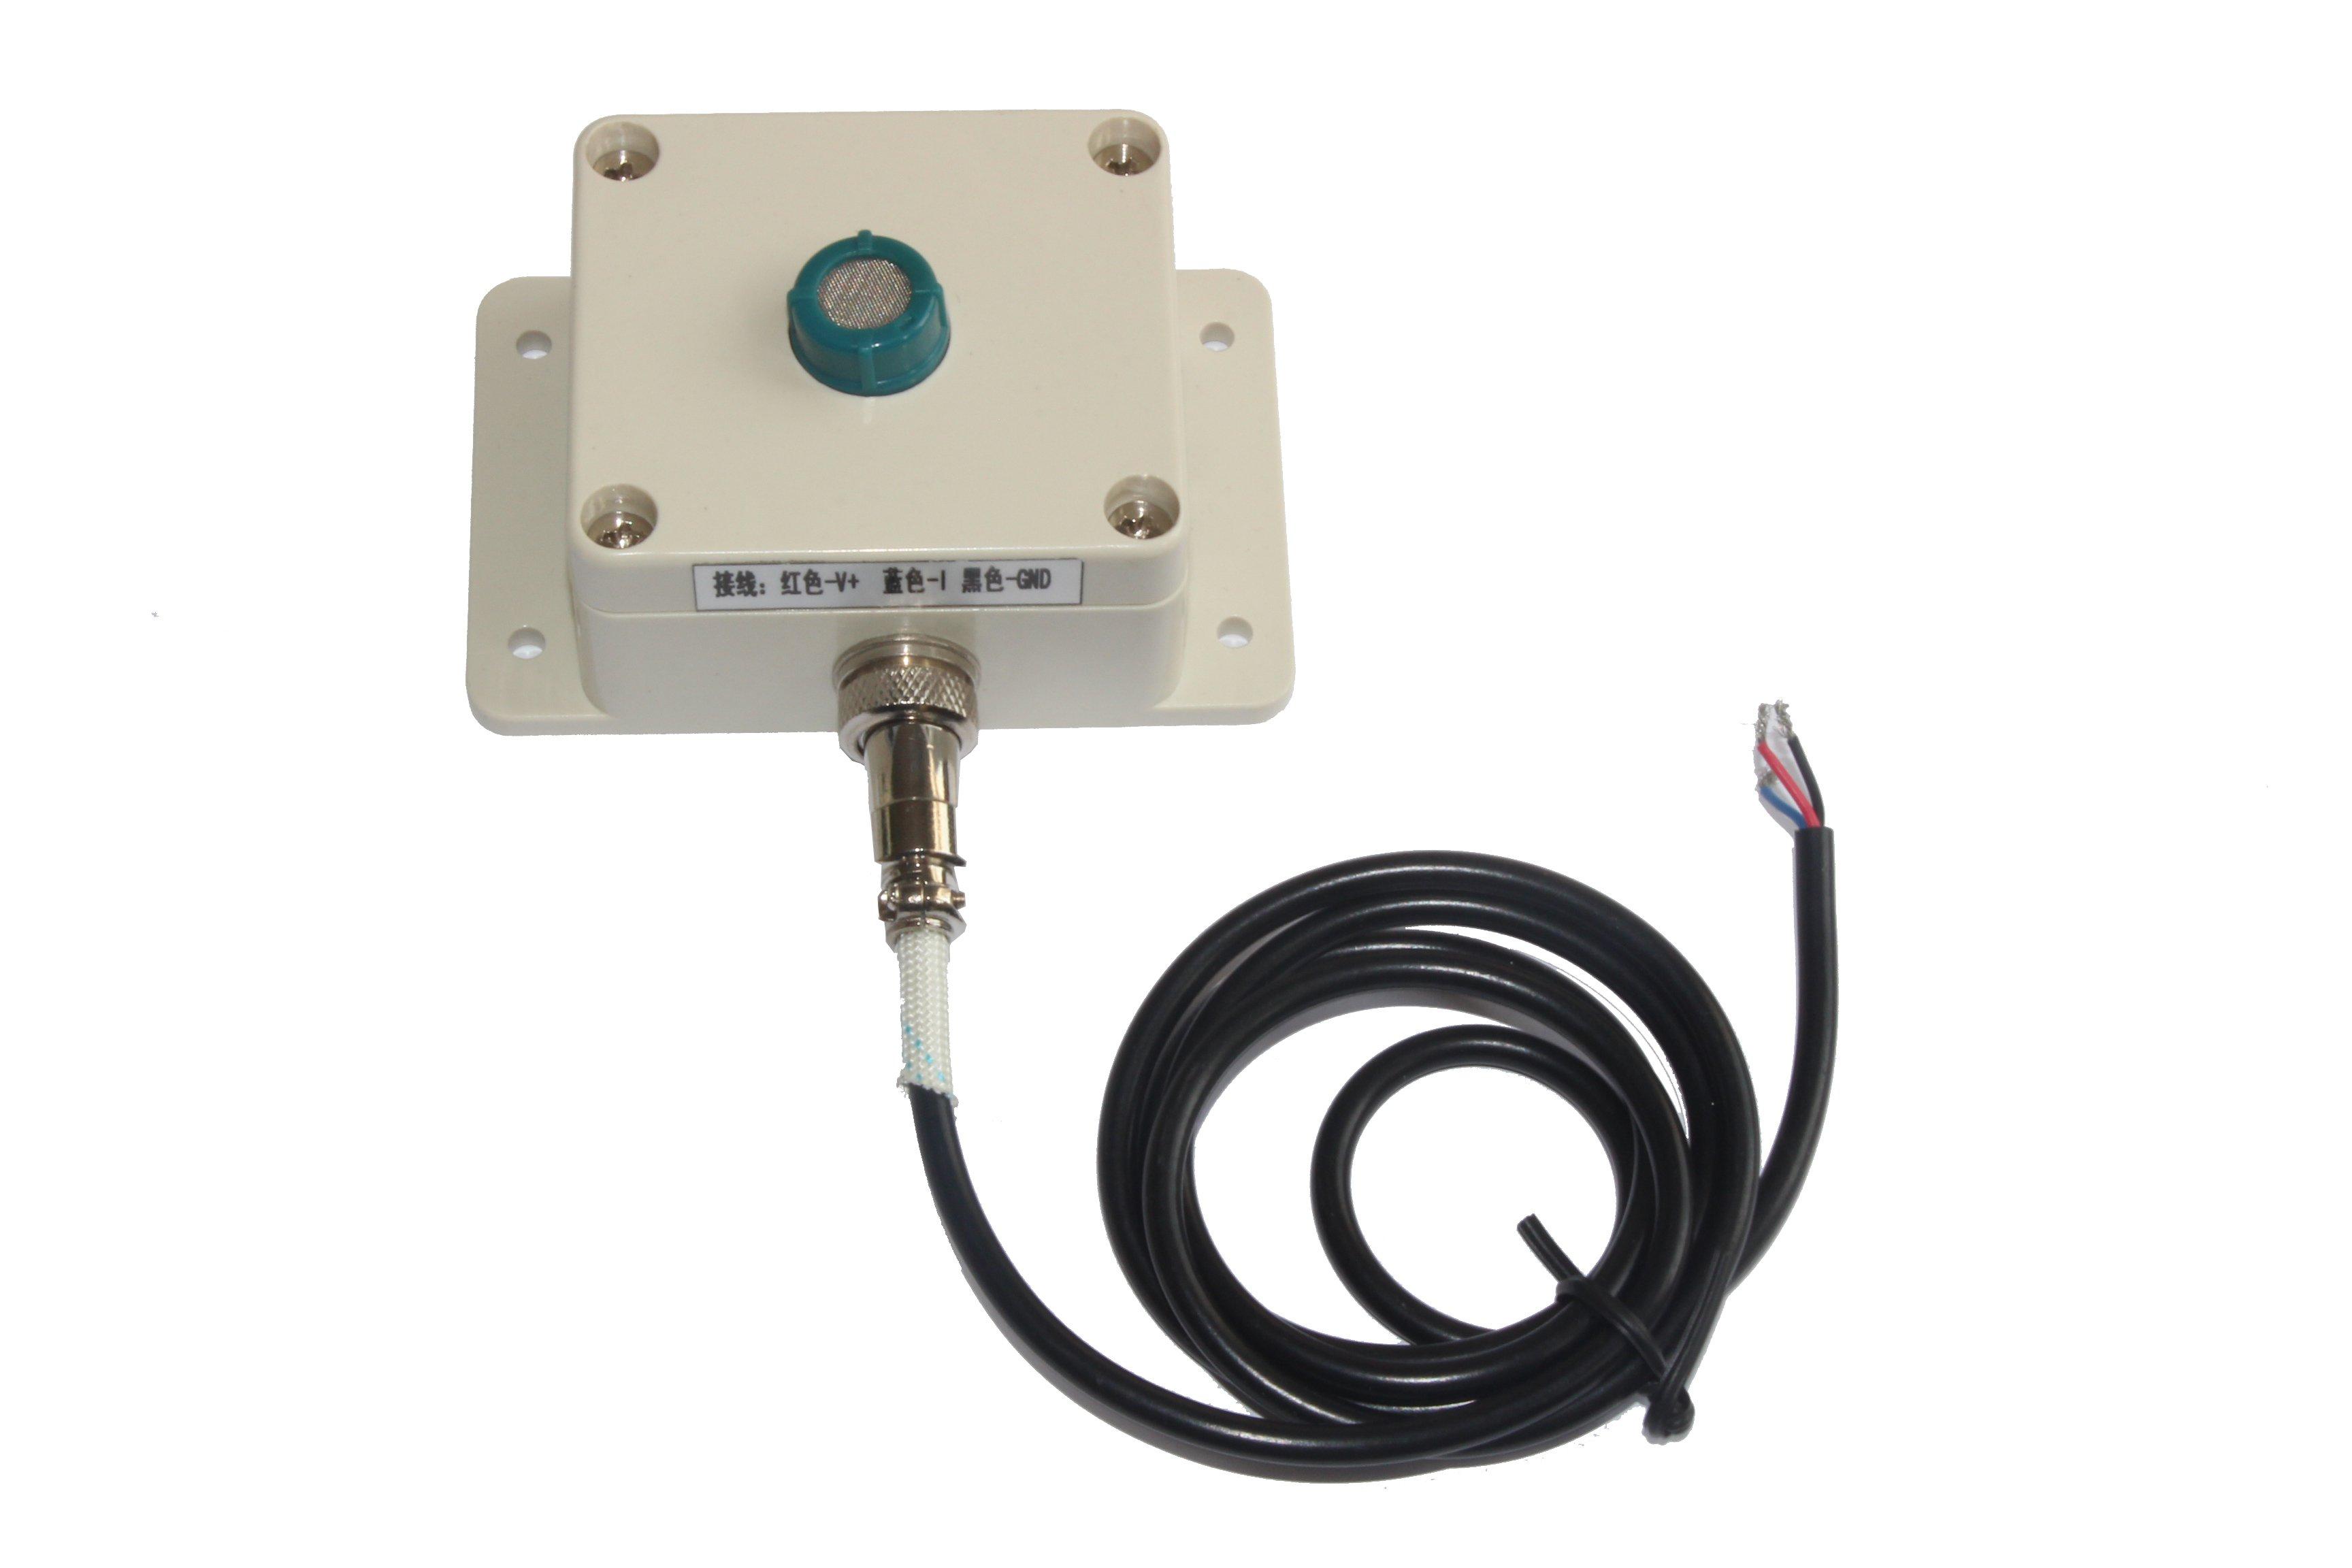 <b>[SM3571M]高灵敏度4-20MA烟雾传感器</b>